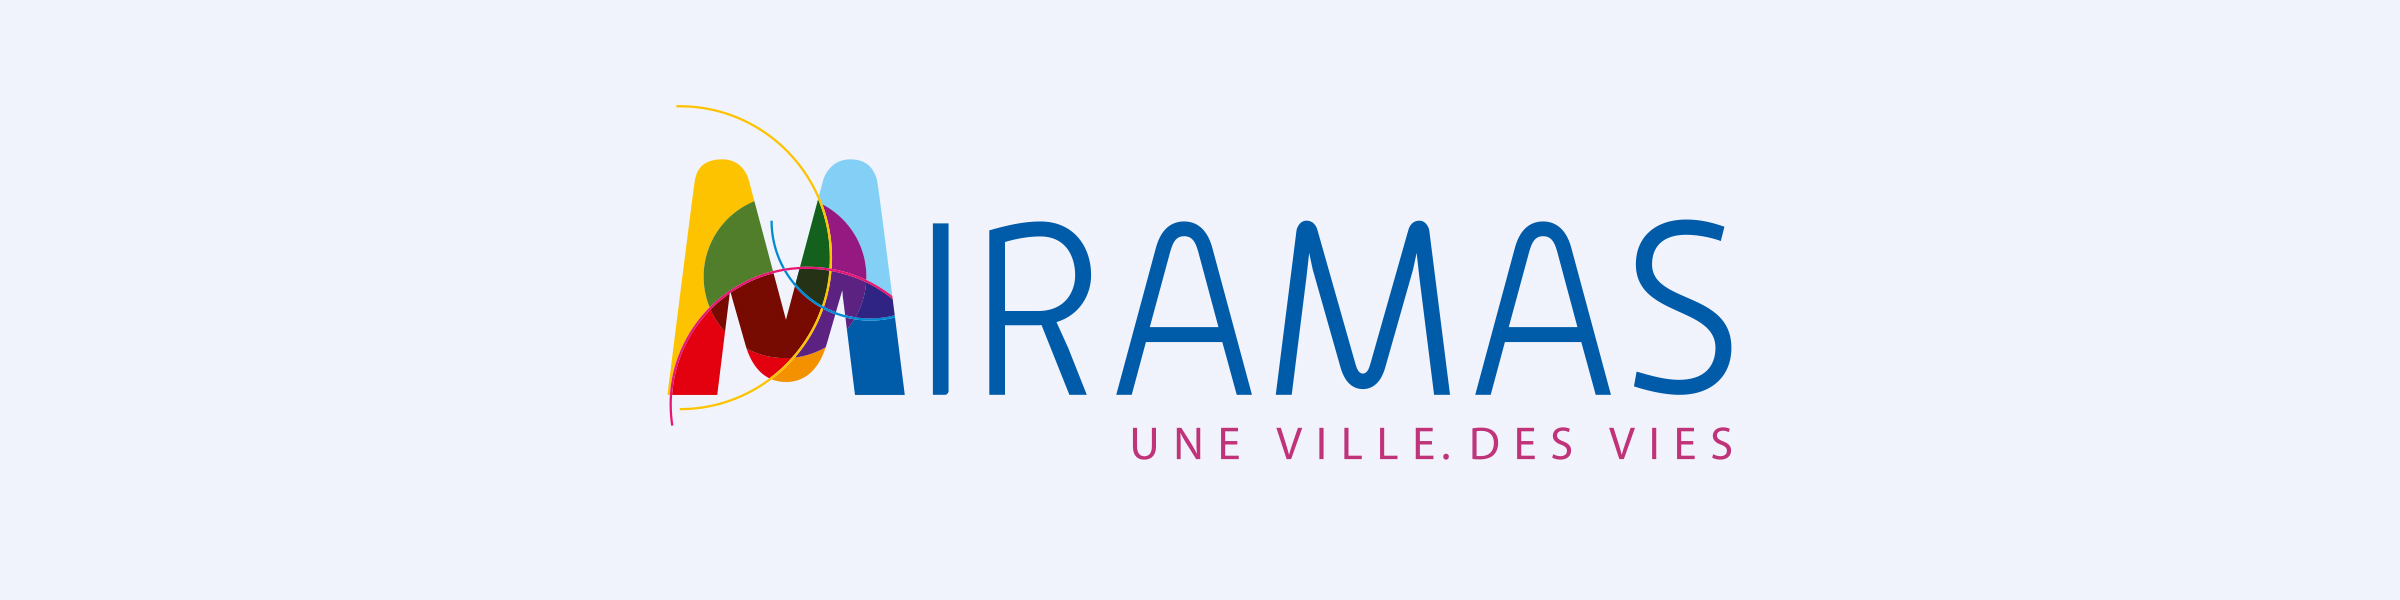 01_MIRAMAS_LOGO